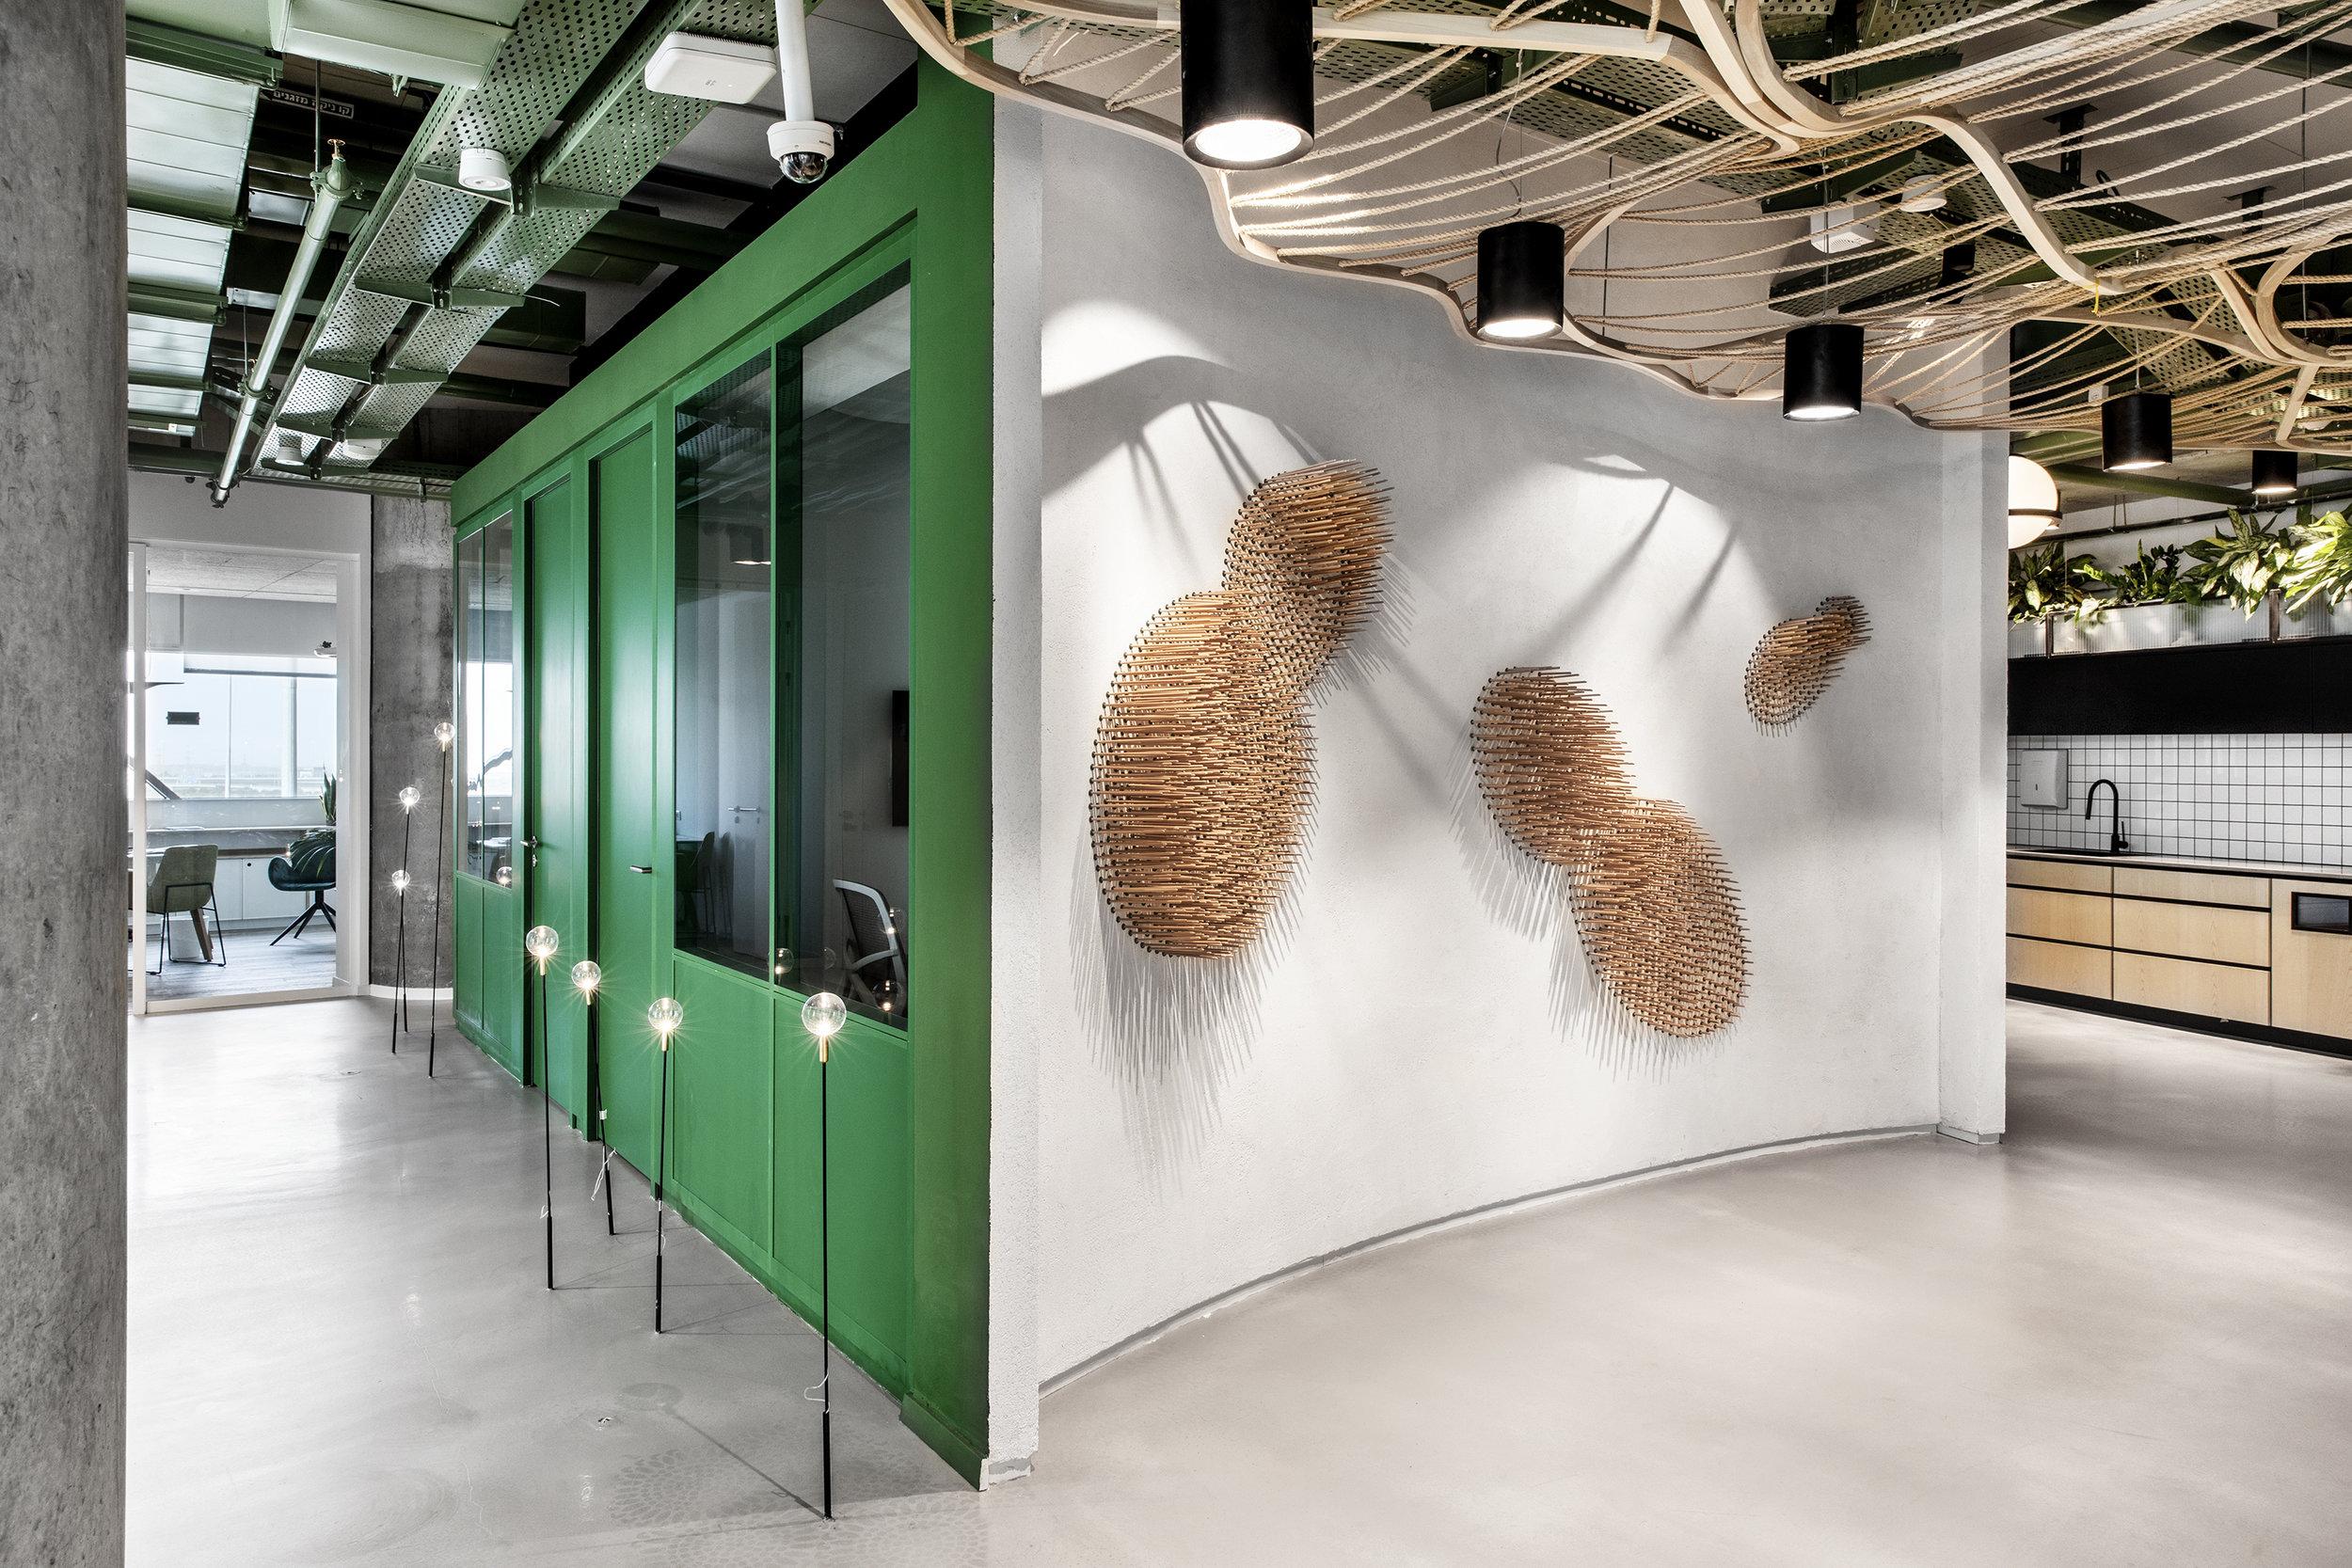 HINNOMAN - ROY DAVID ARCHTECTURE - STUDIO - סטודיו רואי דוד - אדריכלים (7).jpg